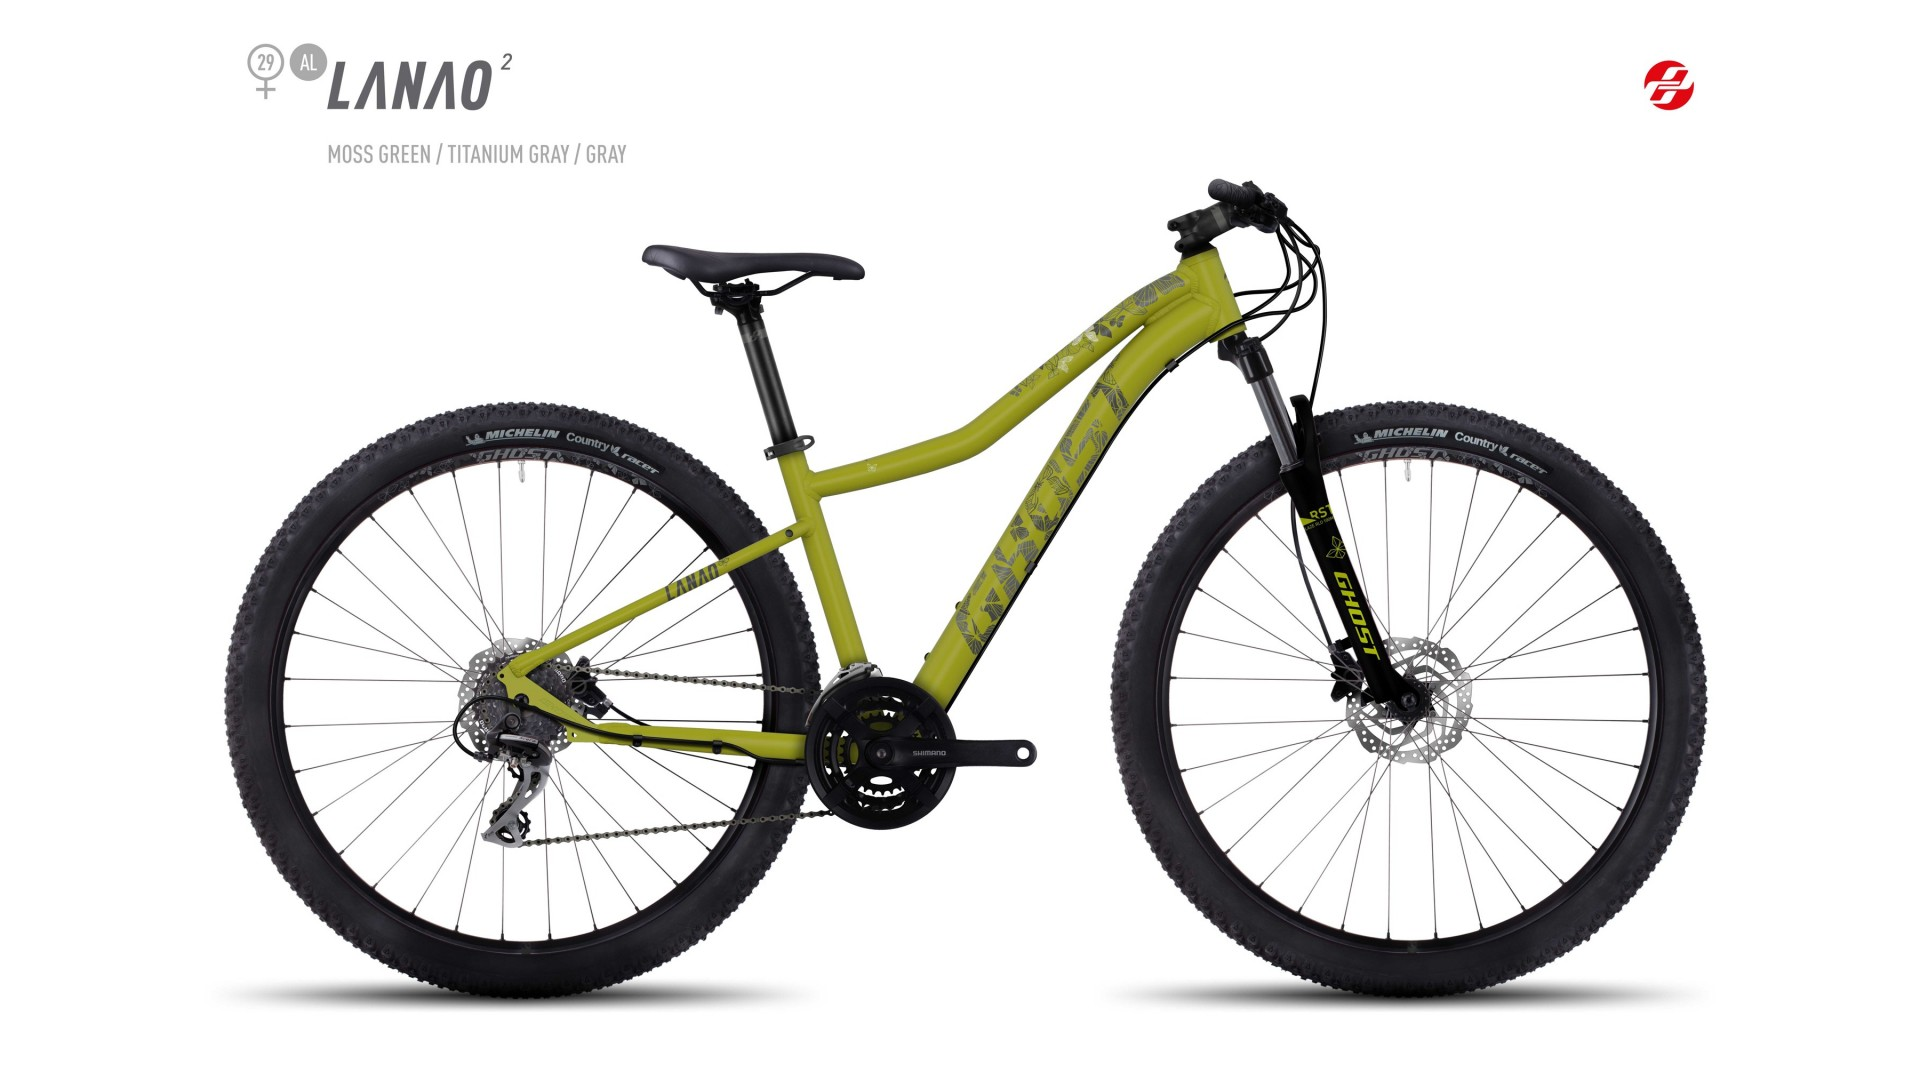 Велосипед GHOST Lanao 2 AL 29 mossgreen/titaniumgrey/grey год 2017